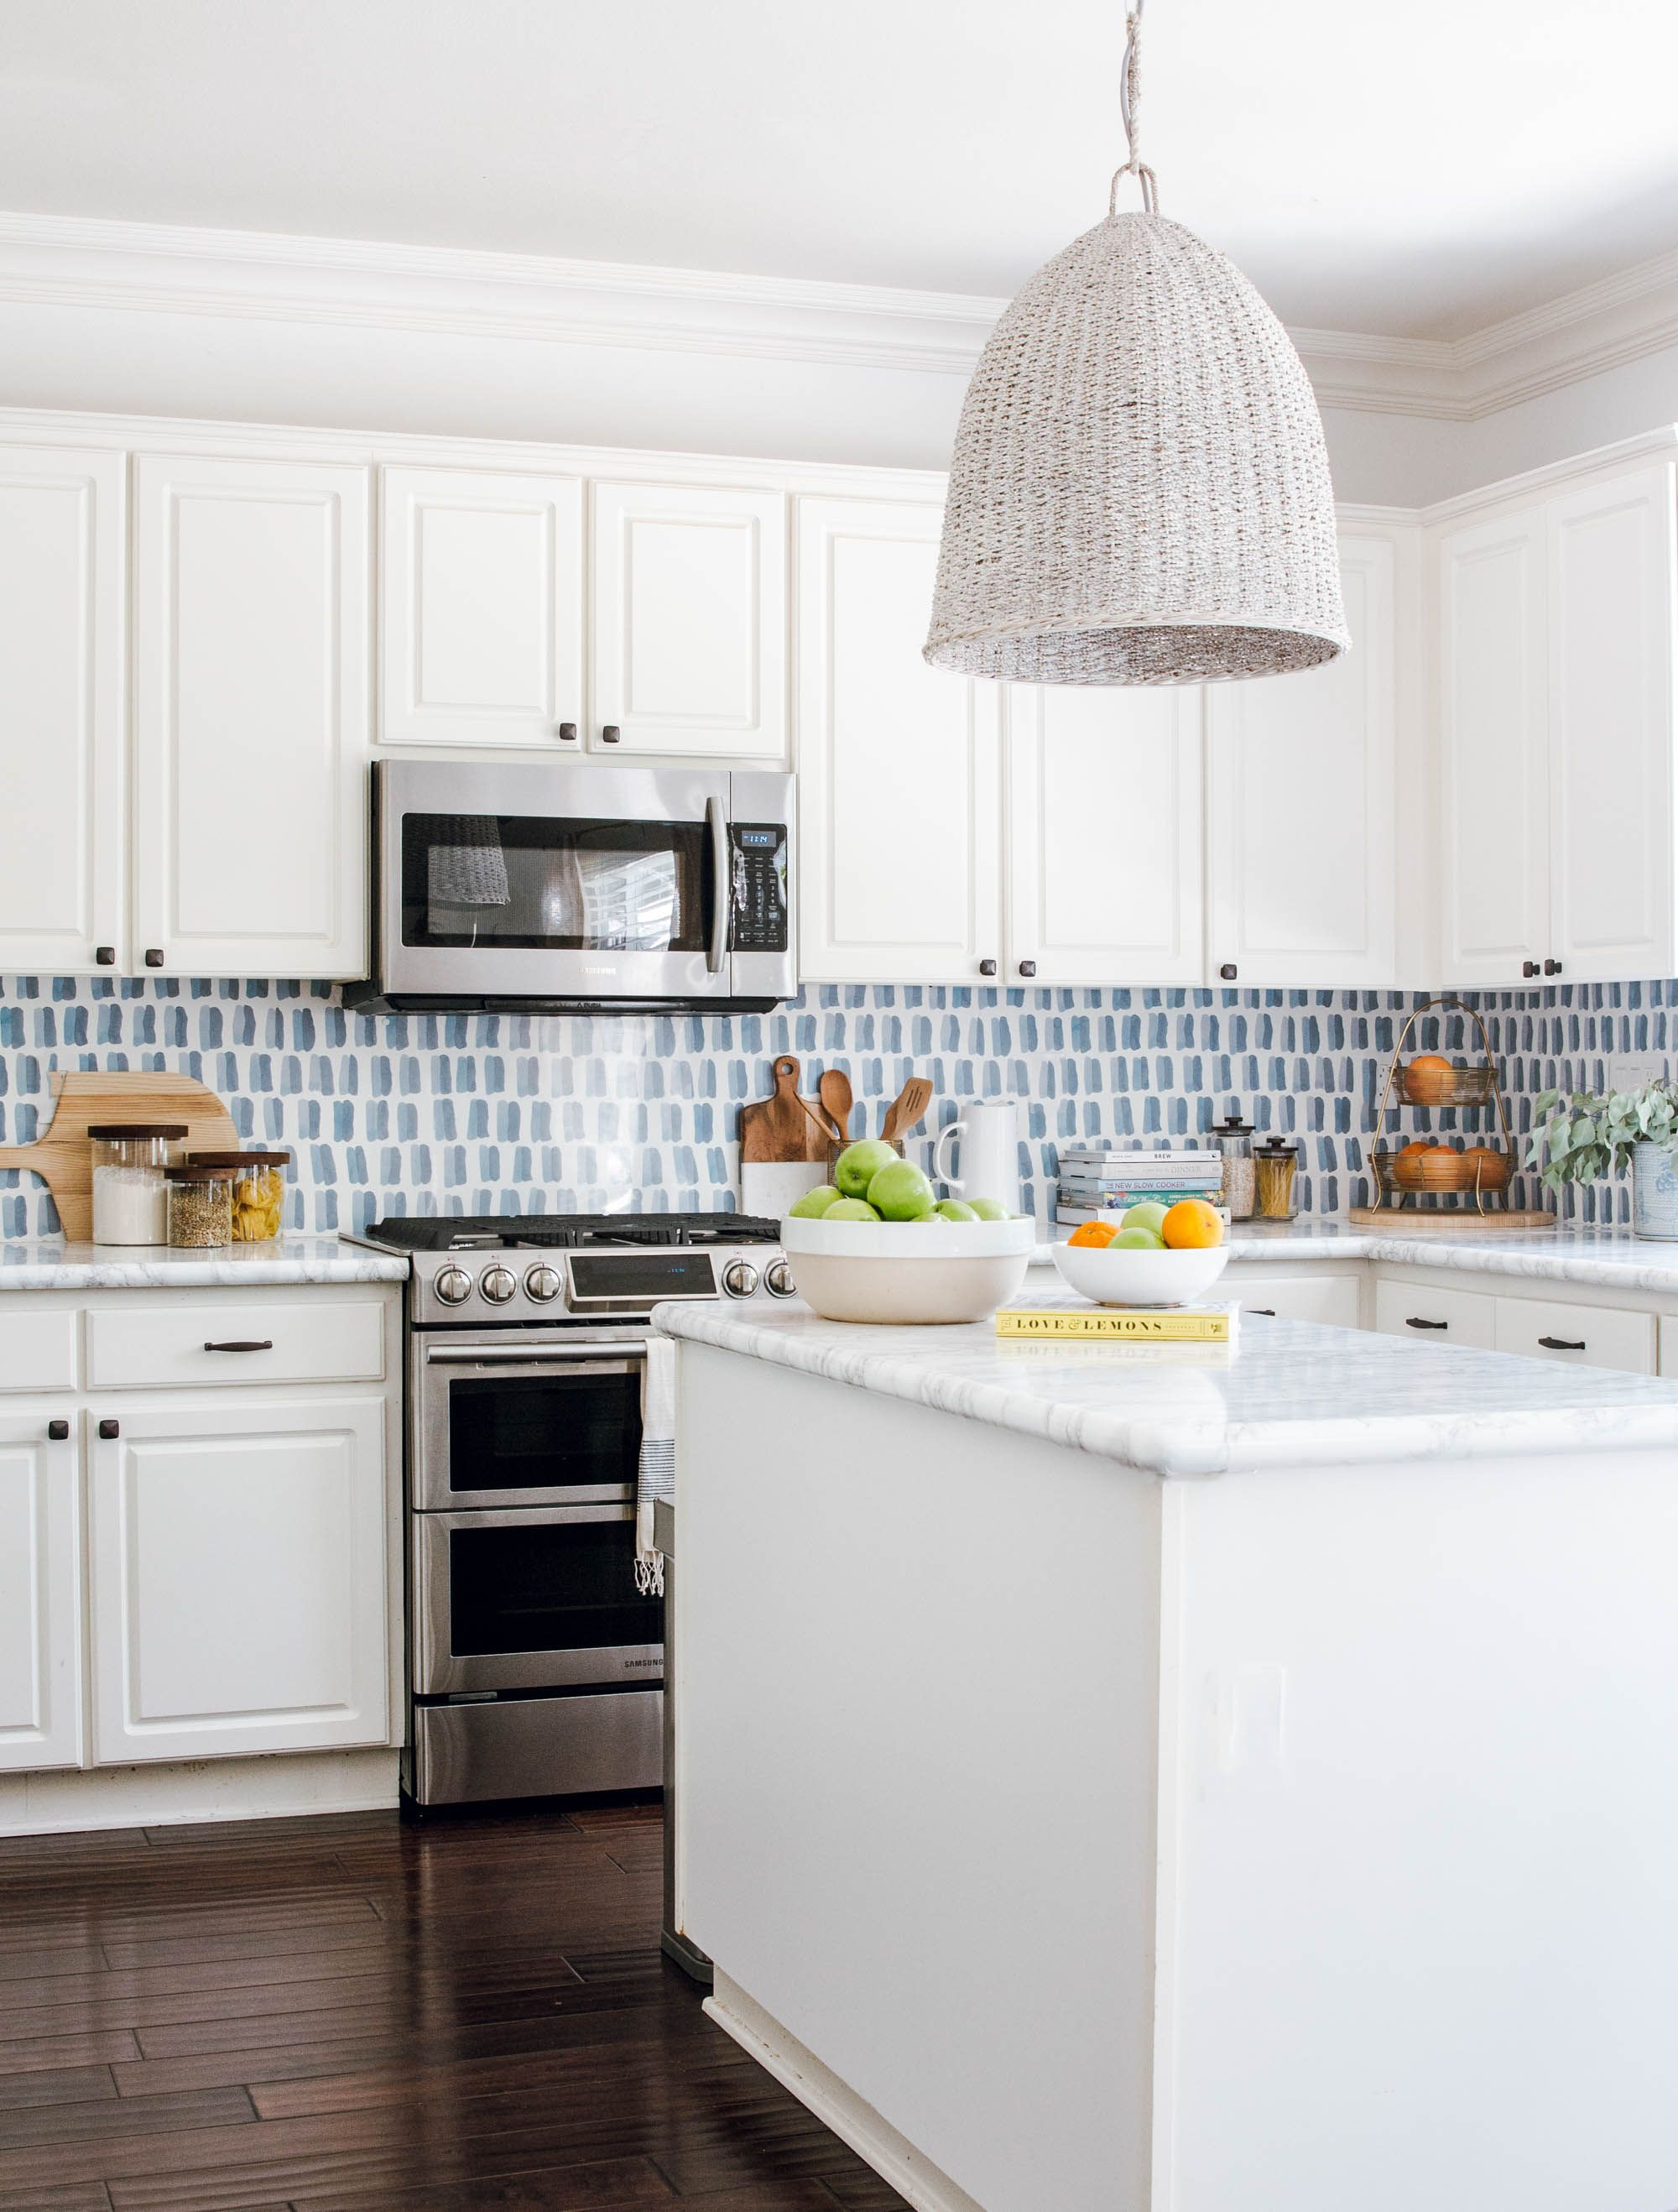 You Need To See Anita Yokota S Diy Kitchen Backsplash Kitchen Wallpaper Diy Kitchen Backsplash Kitchen Renovation Cost